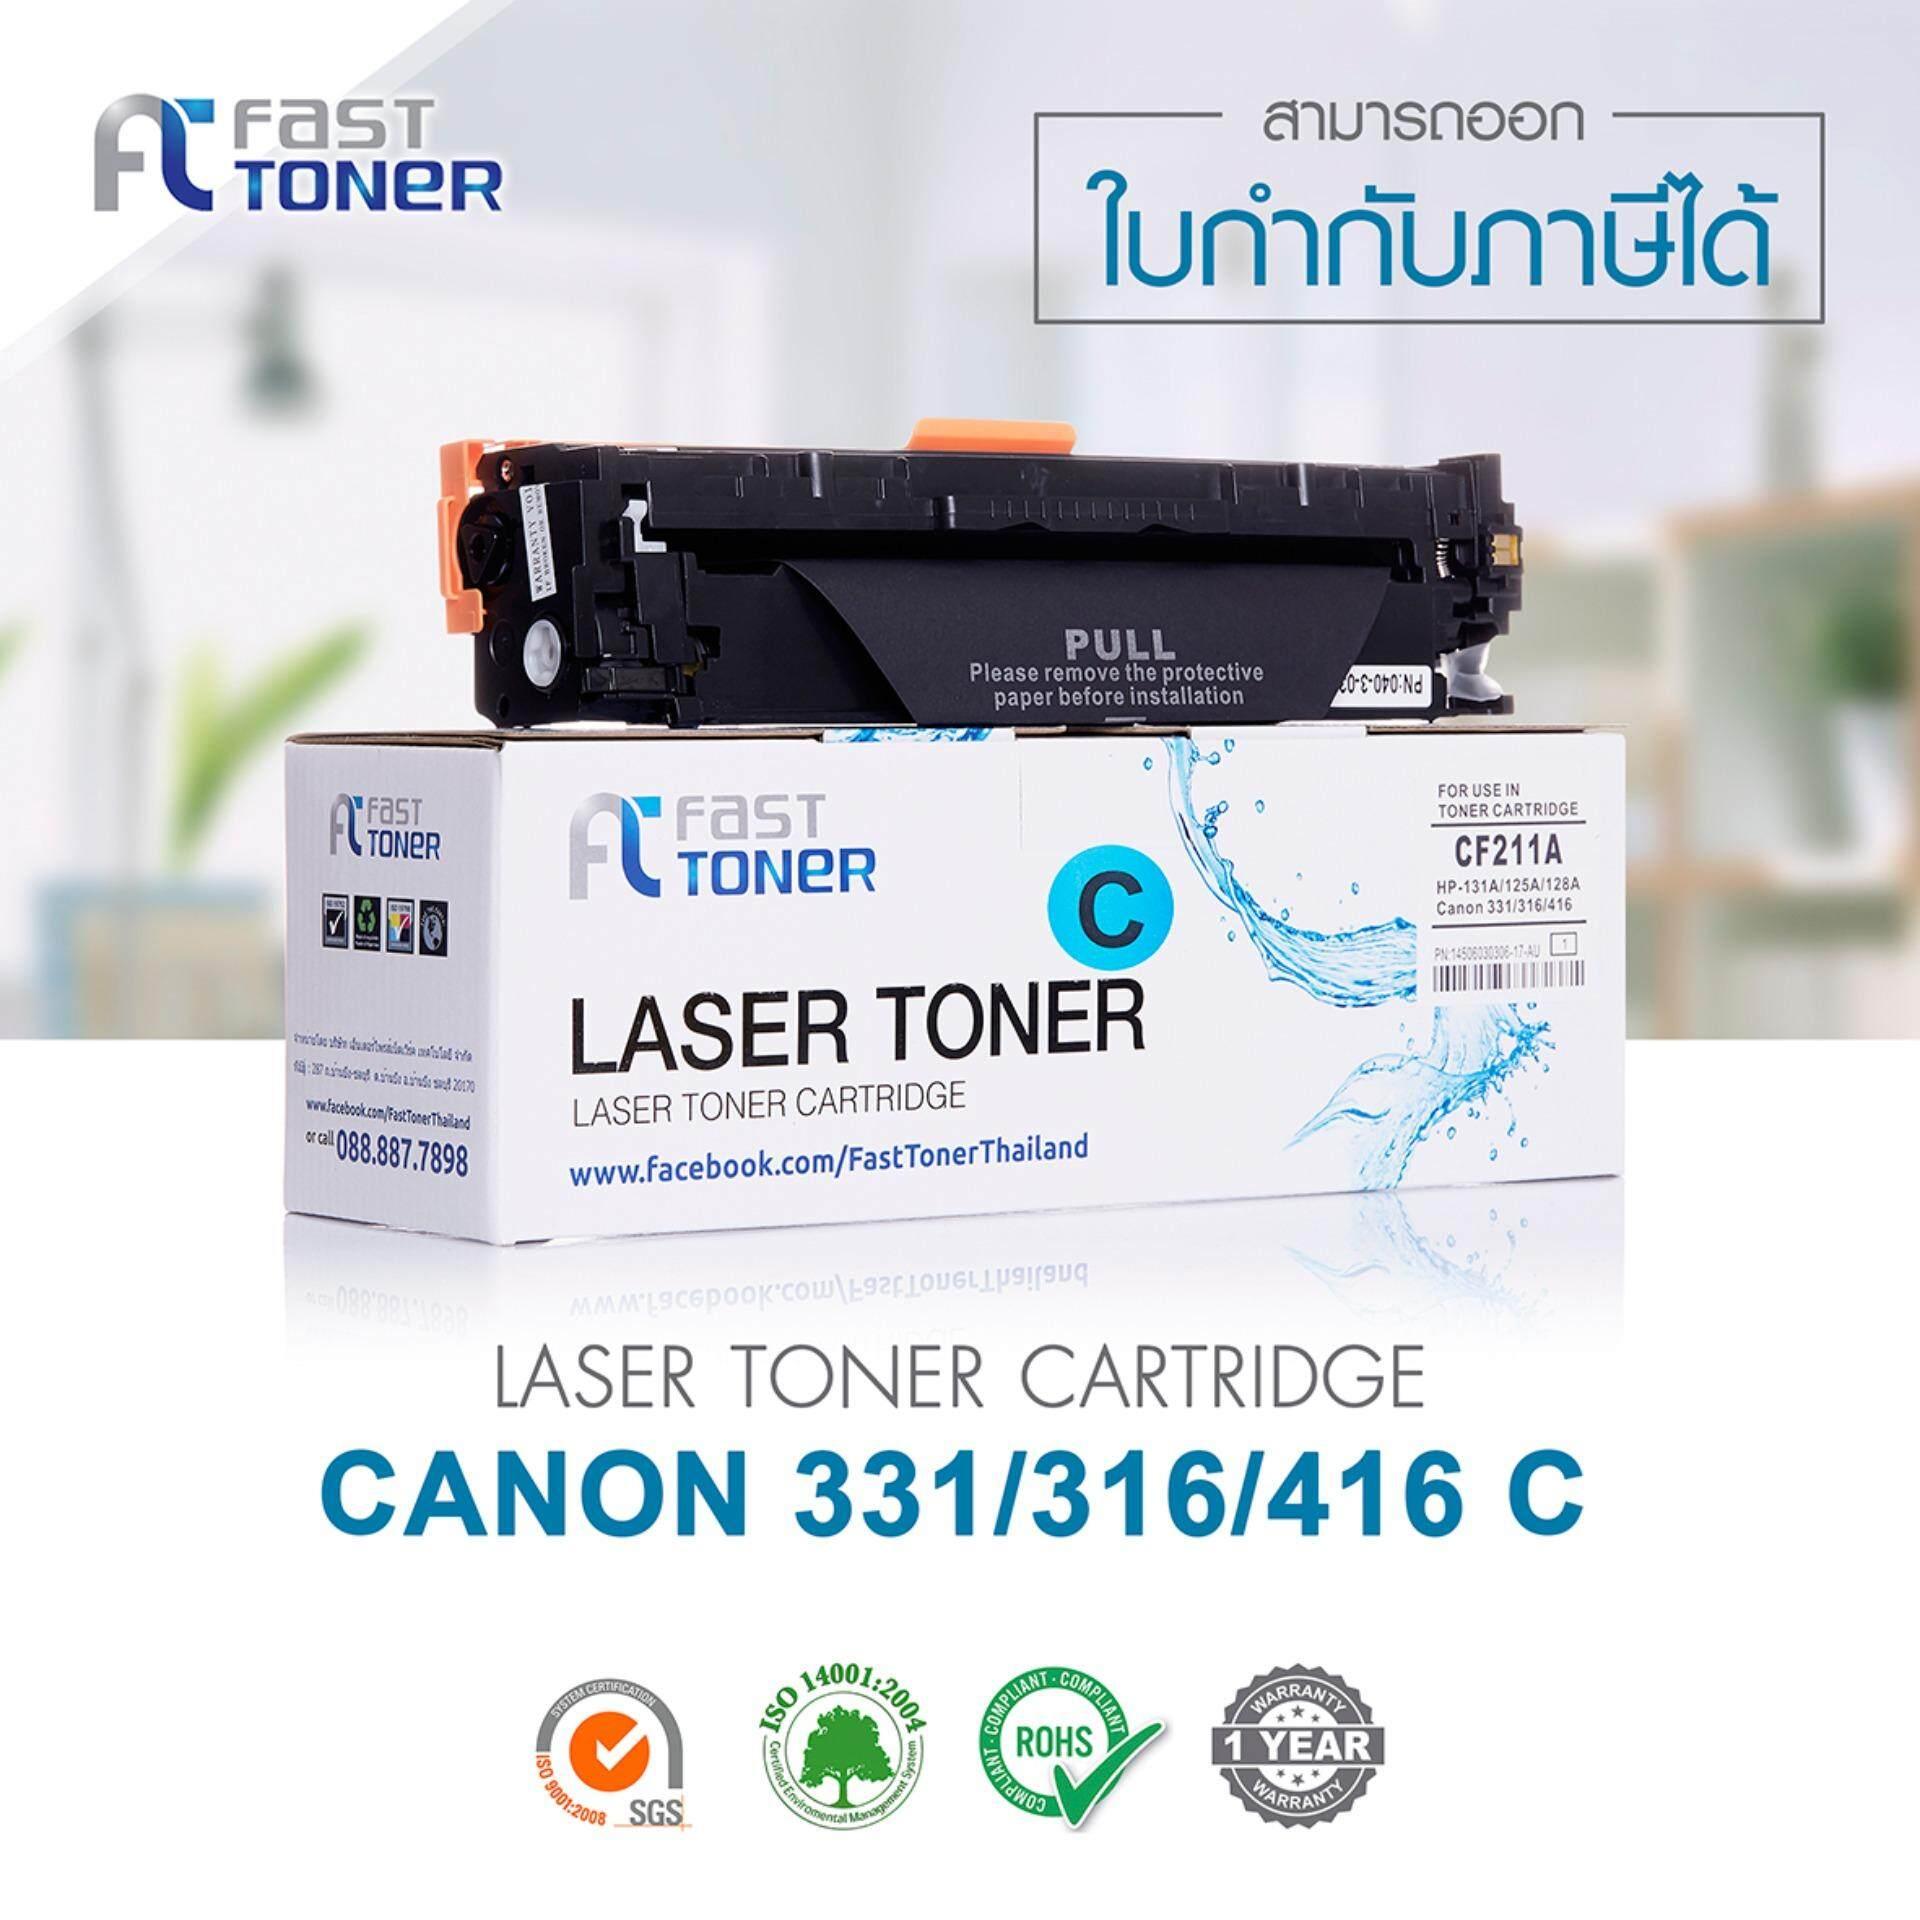 Fast Toner ตลับหมึกเทียบเท่า Canon Cartridge 331 316 416 Hp 131 125A 128A สีฟ้า สำหรับปริ้นเตอร์รุ่น Hp Laserjet Pro 200 Color M251Nw M276 Canon Laser Shot Lbp 7100 7110 Canon I Sensys Mf 8230 Canon I Sensys Mf 8280 กรุงเทพมหานคร